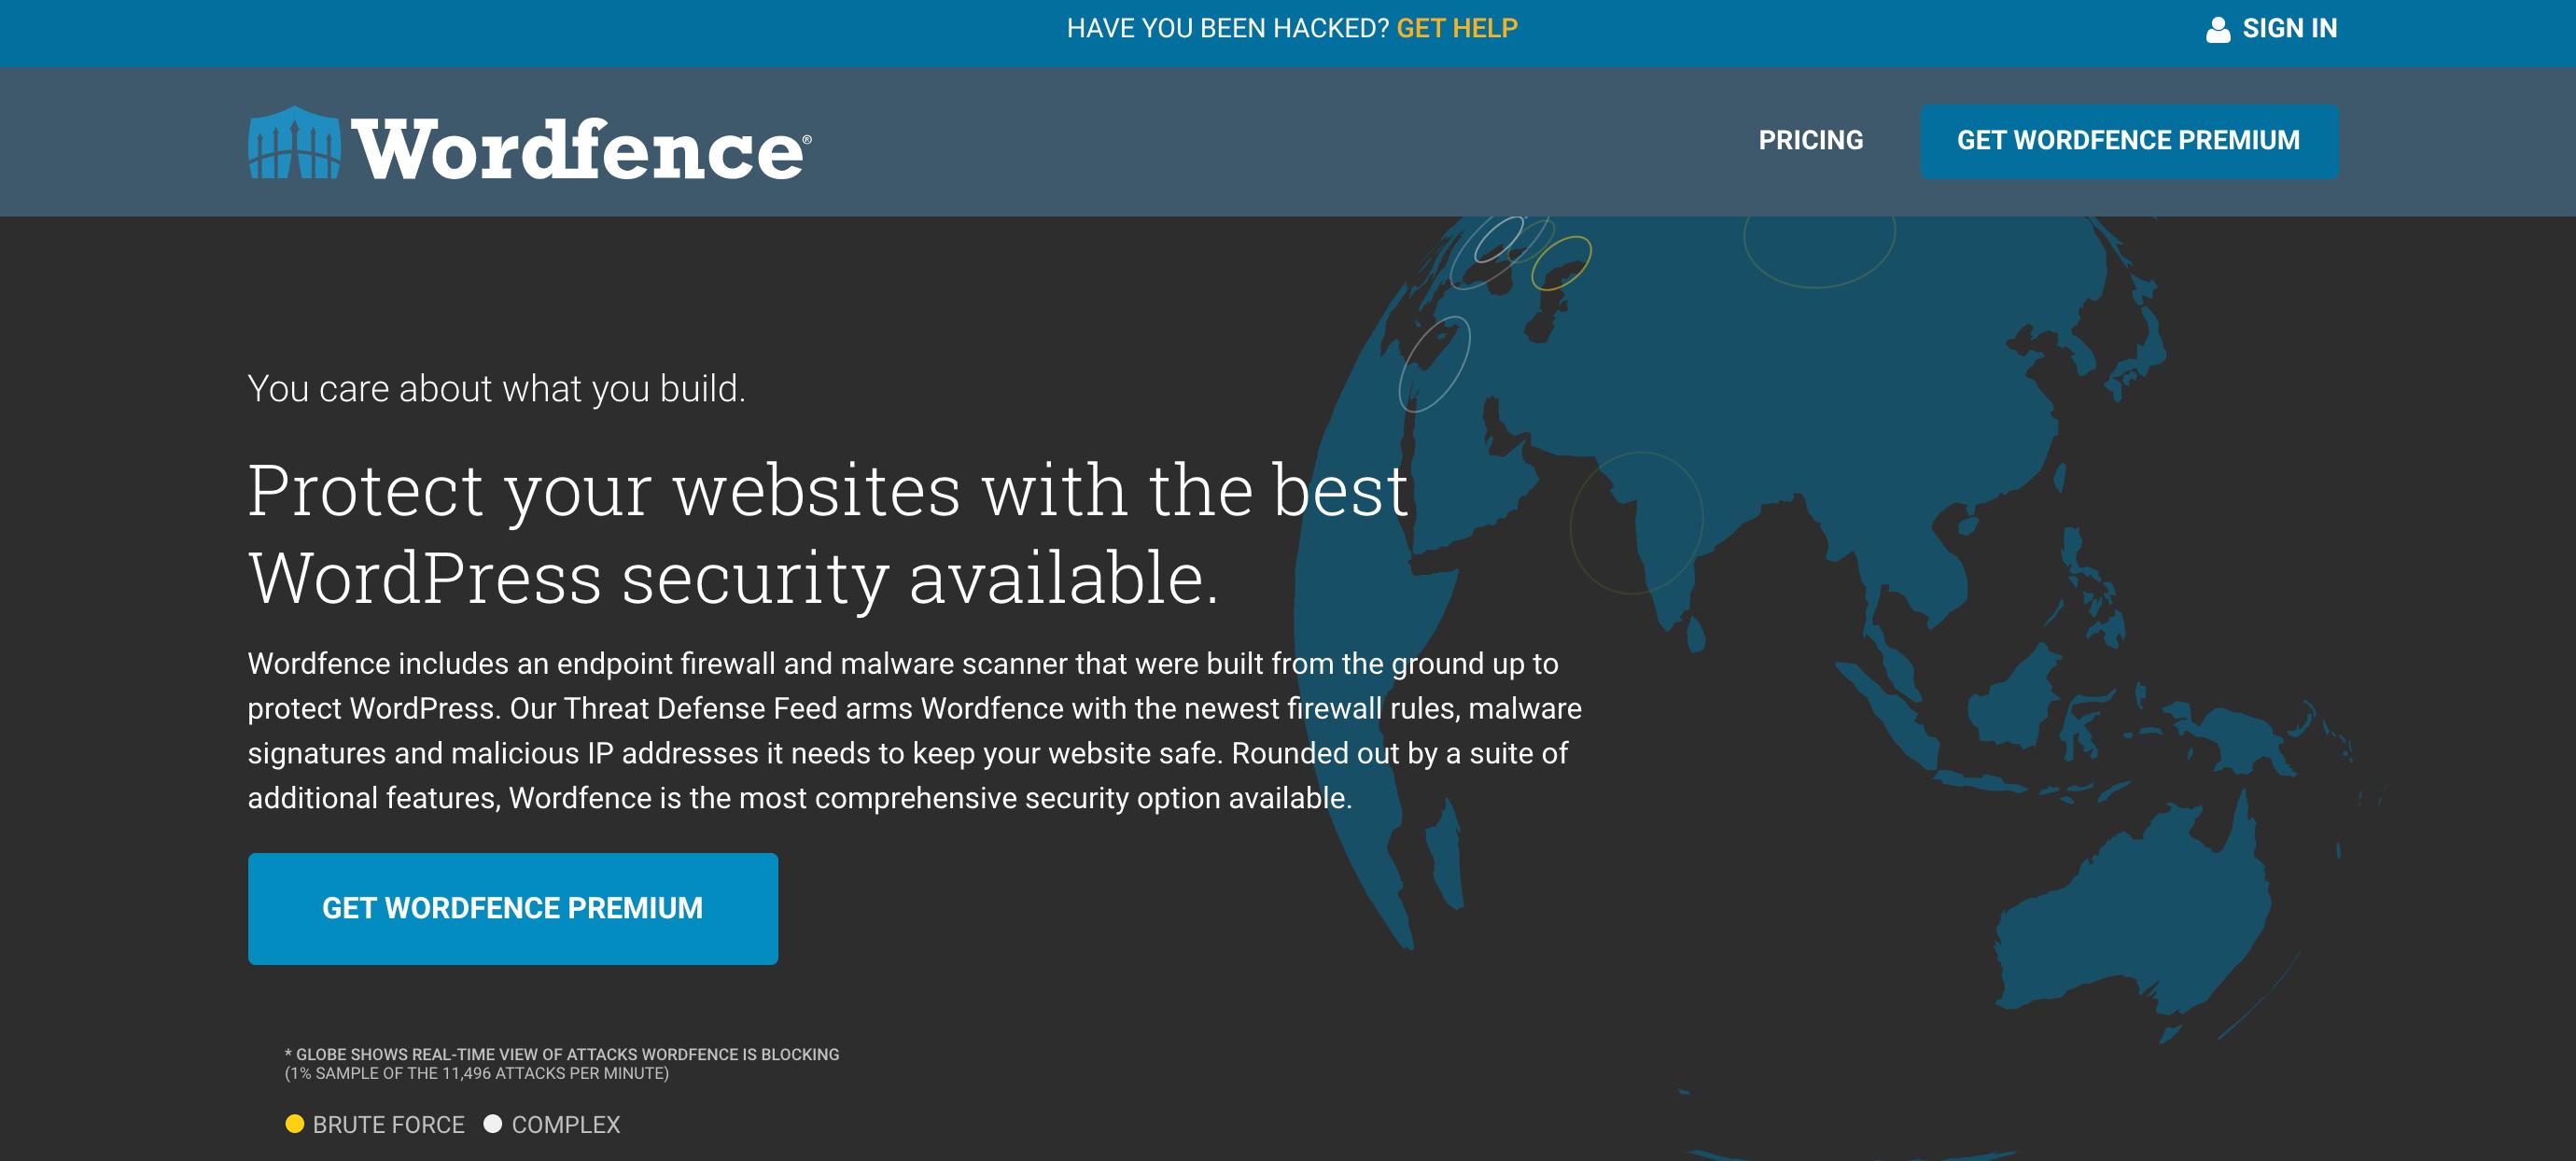 Create a secure WordPress website by using a firewall.